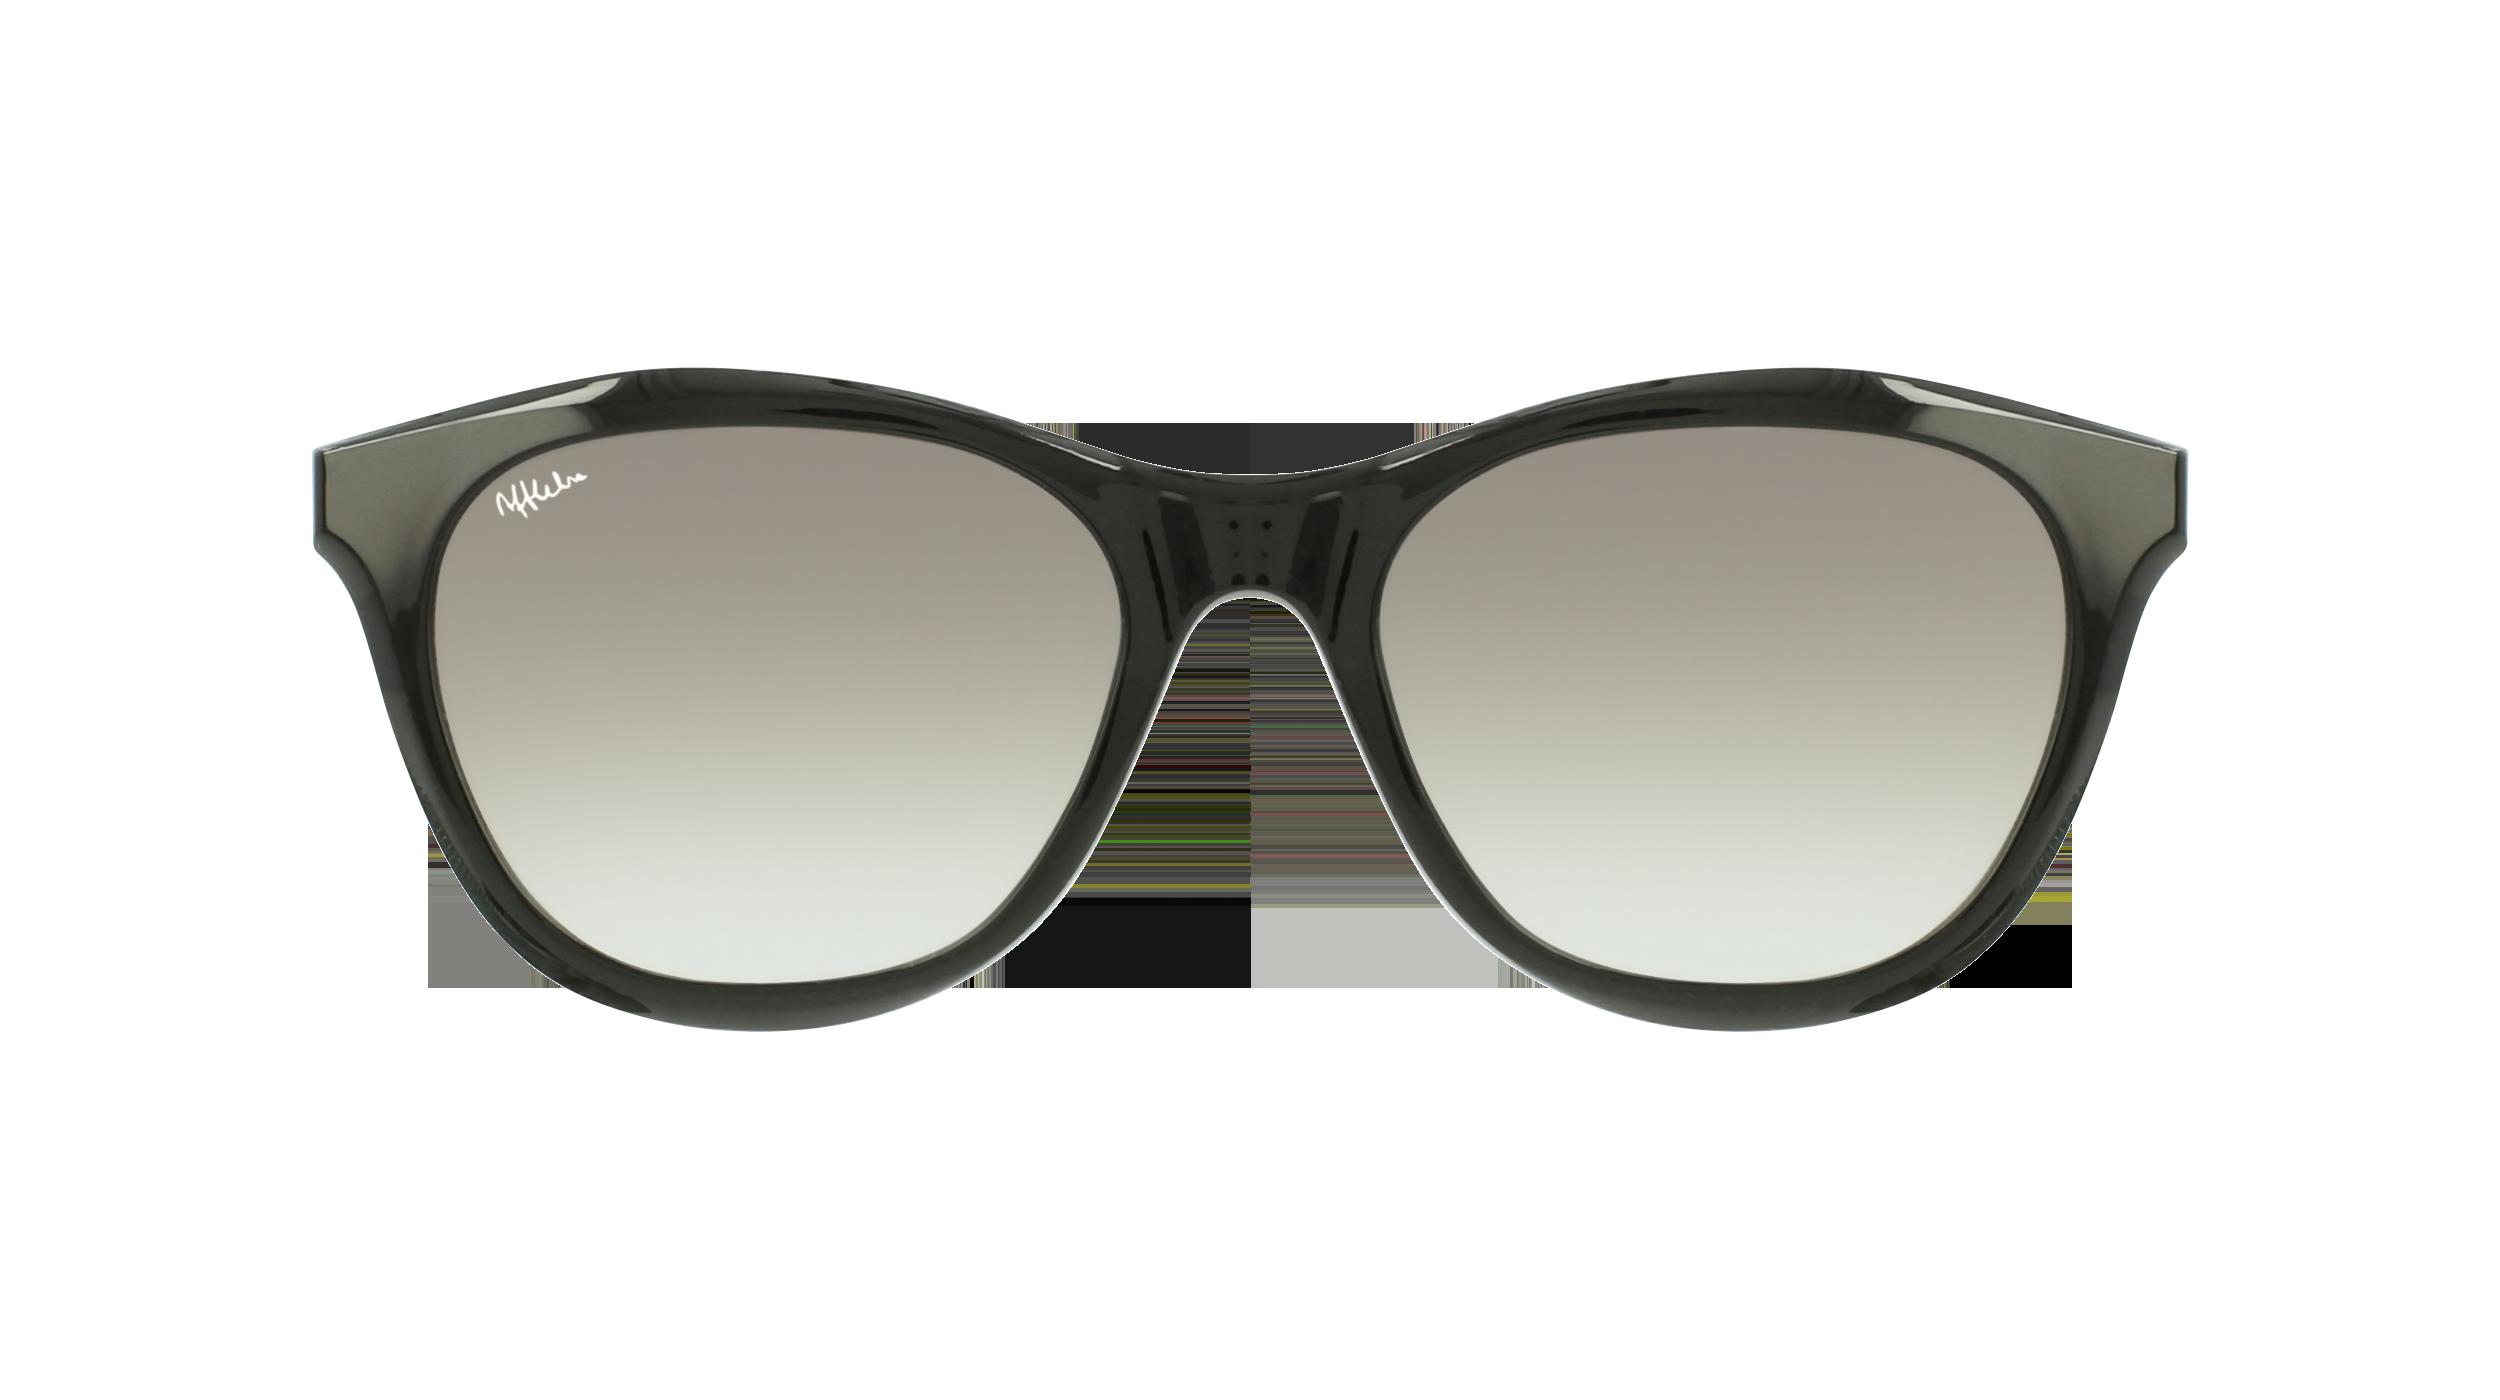 afflelou/france/products/smart_clip/clips_glasses/07630036457689.png